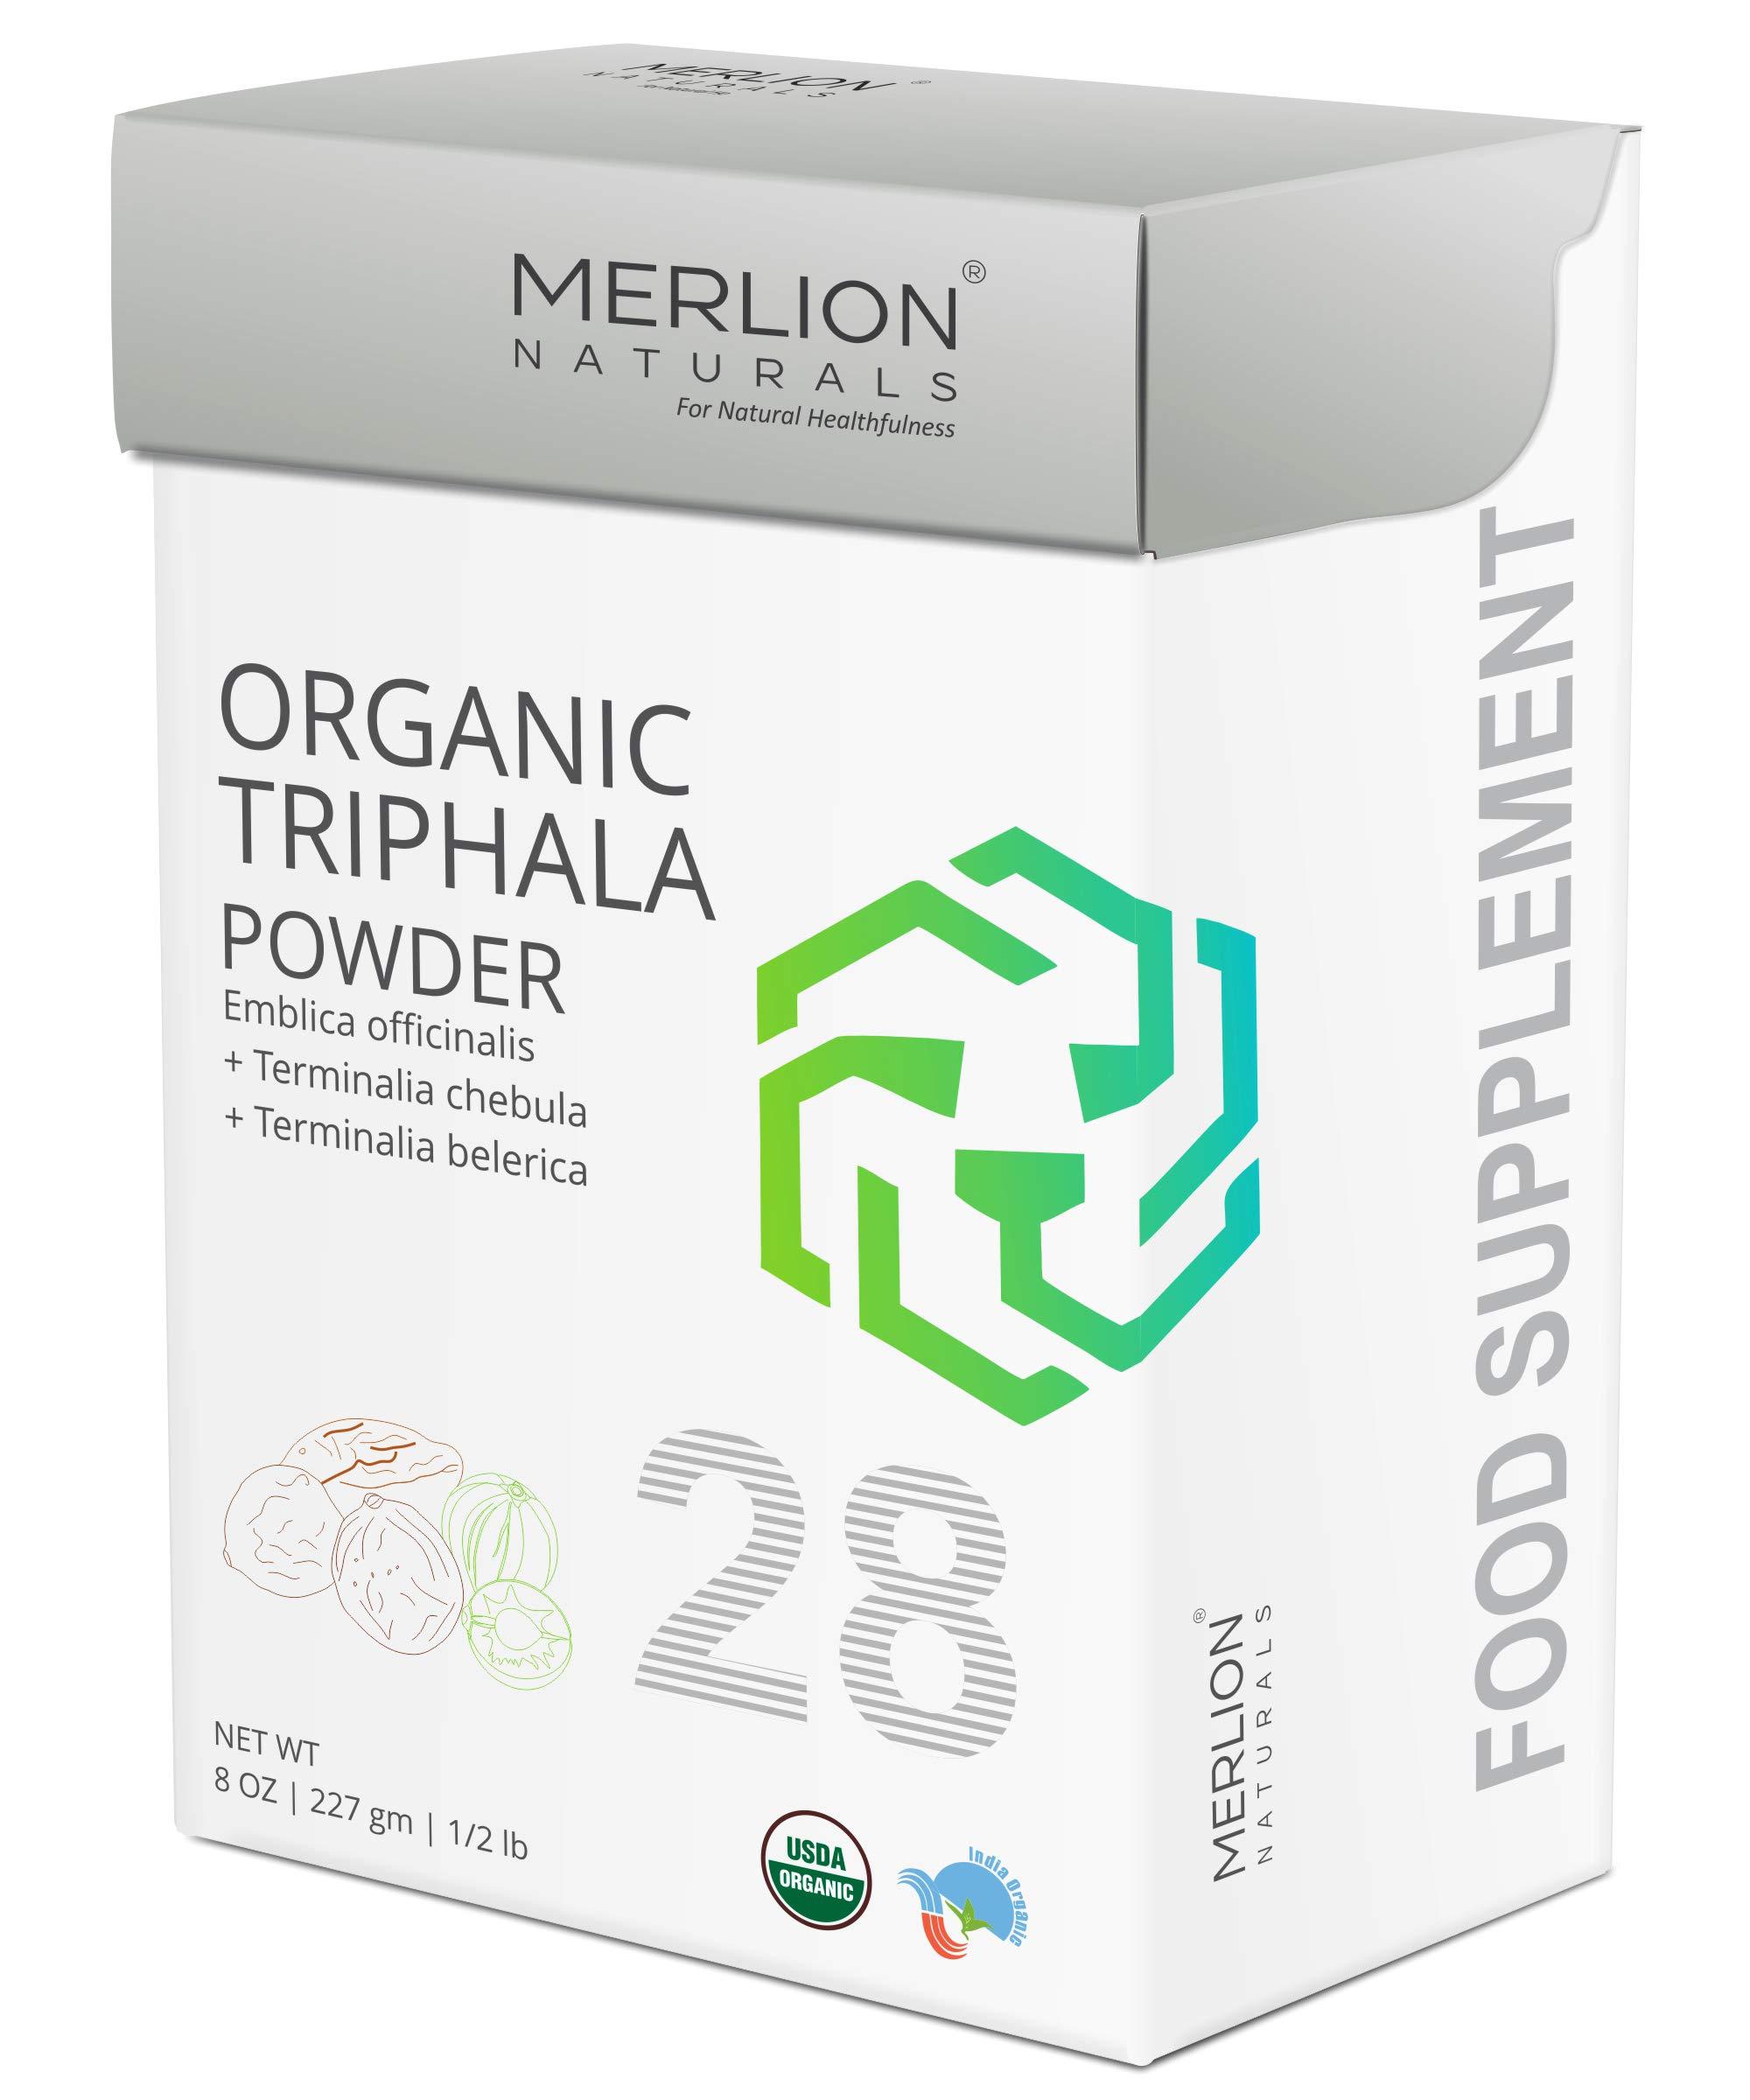 Organic Triphala Powder by Merlion Naturals   Amla, Haritaki and Baheda   227gm/ 8OZ/ 1/2lb   USDA NOP Certified 100% Organic